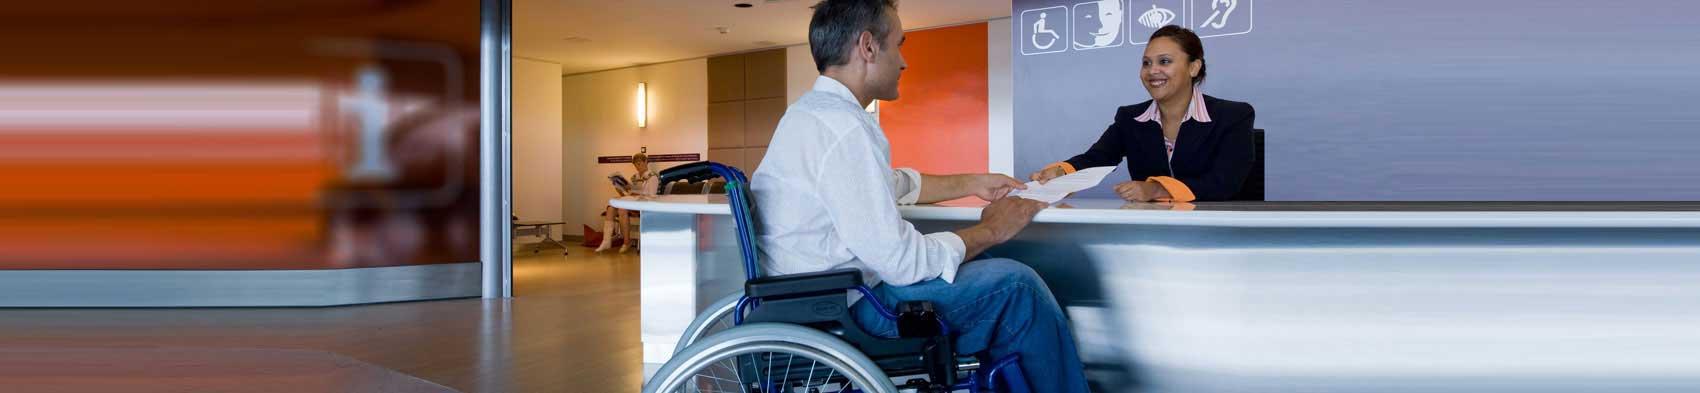 Personnes Mobilit Rduite Contacter CDG Et Orly